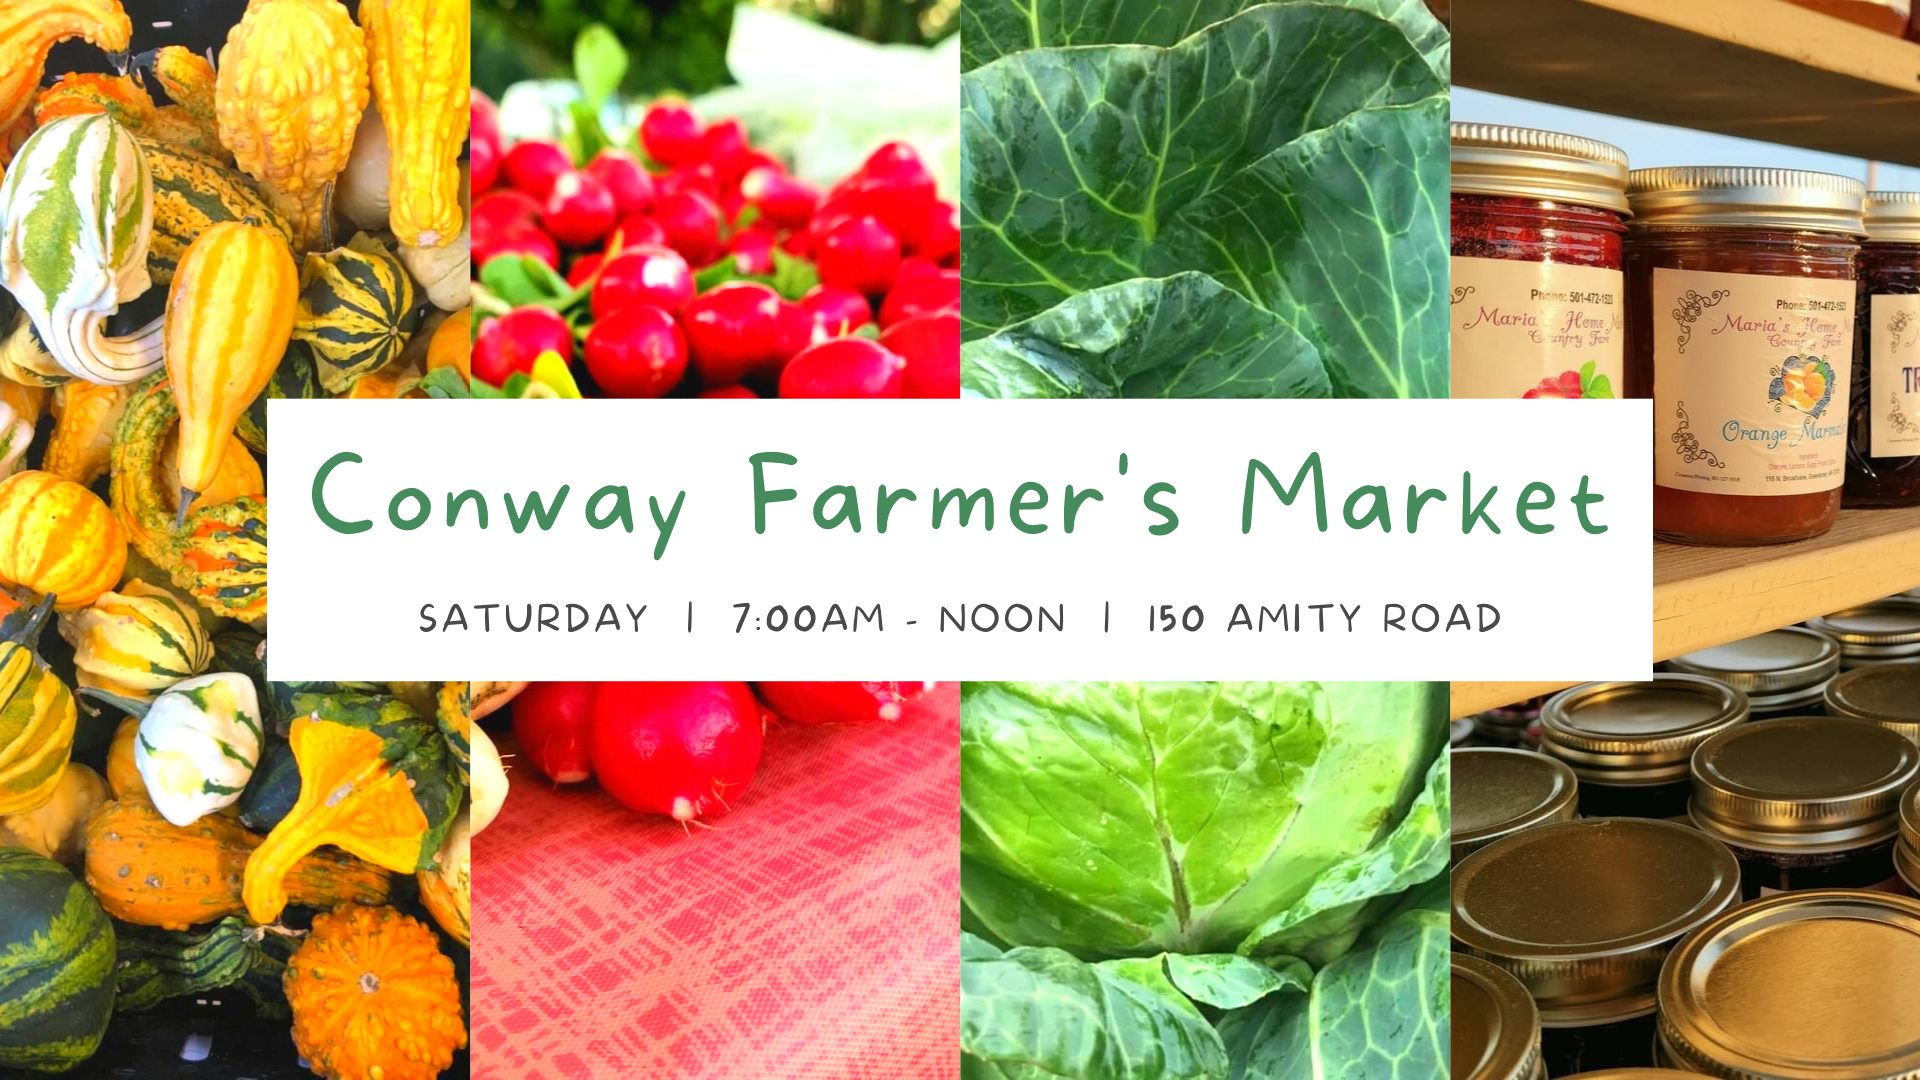 Conway Farmer's Market